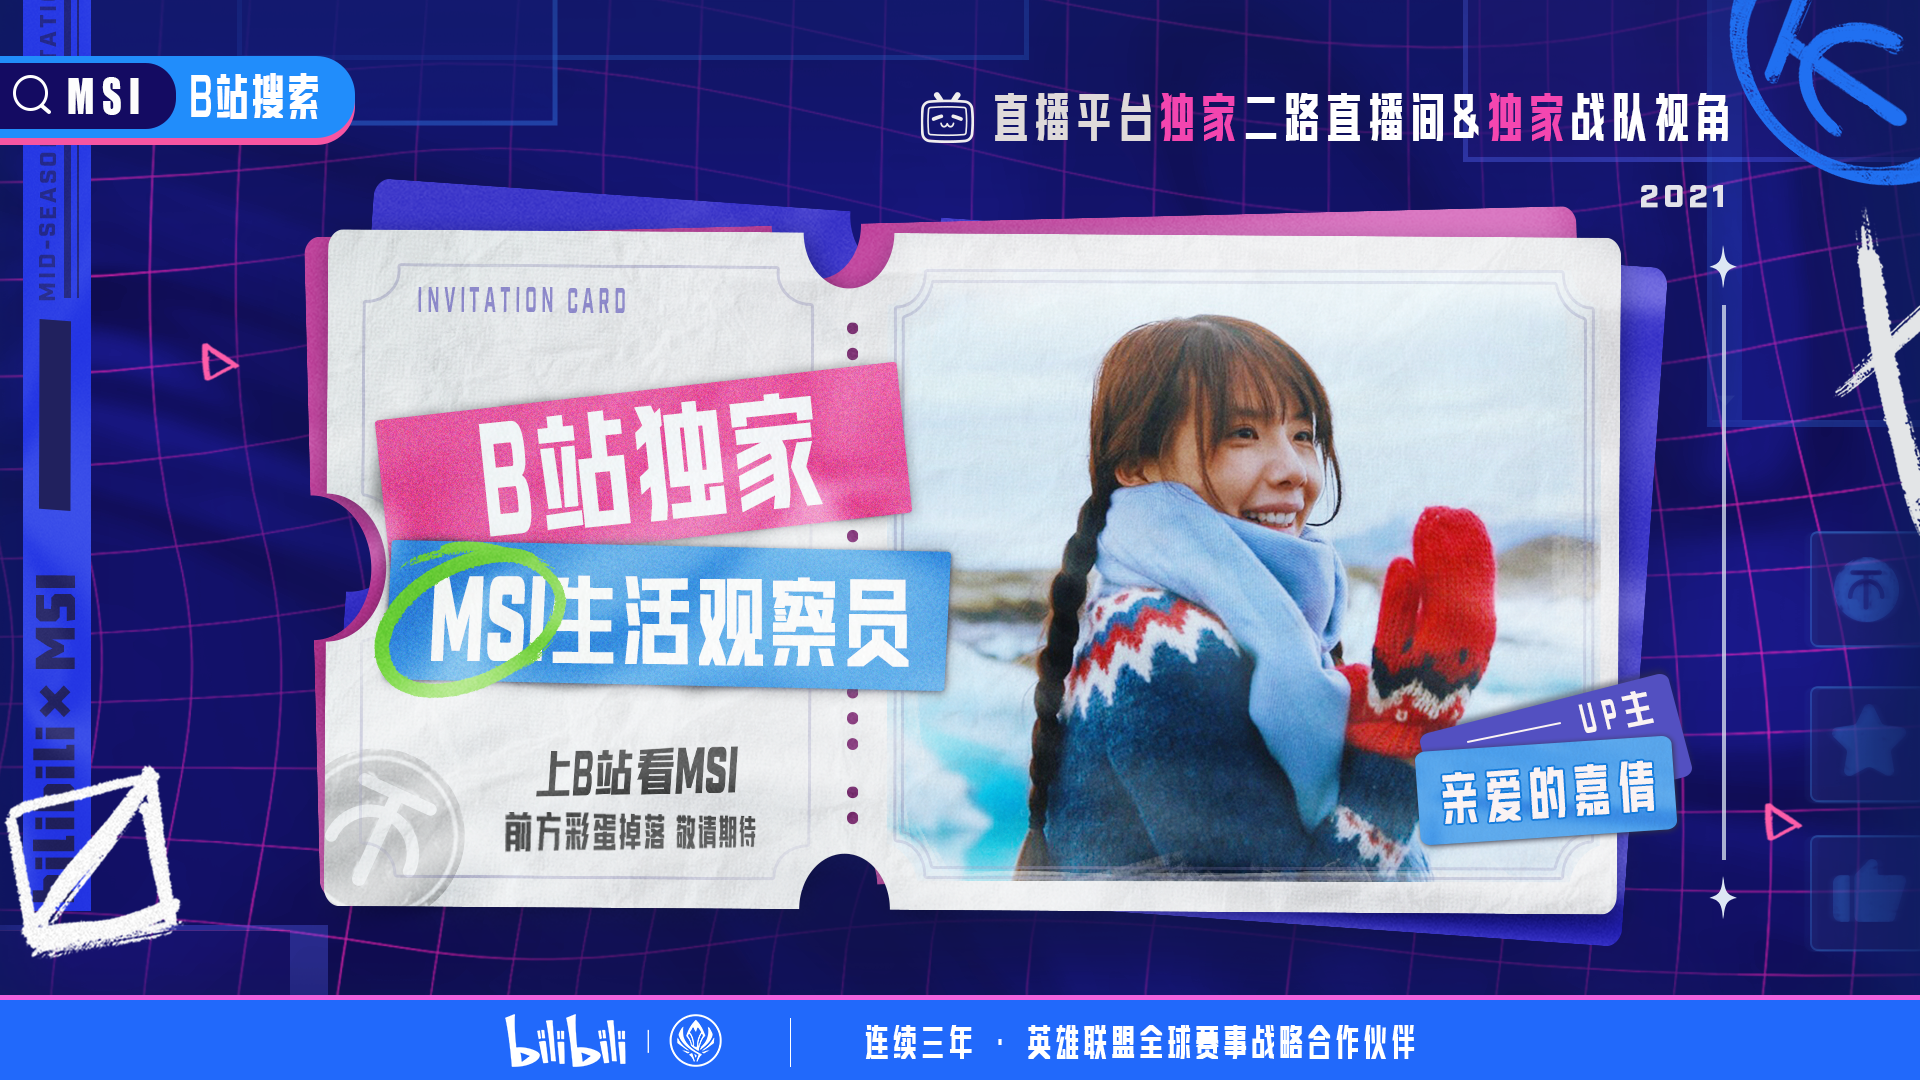 B站将全程直播英雄联盟MSI赛事 并独家上线第二直播间